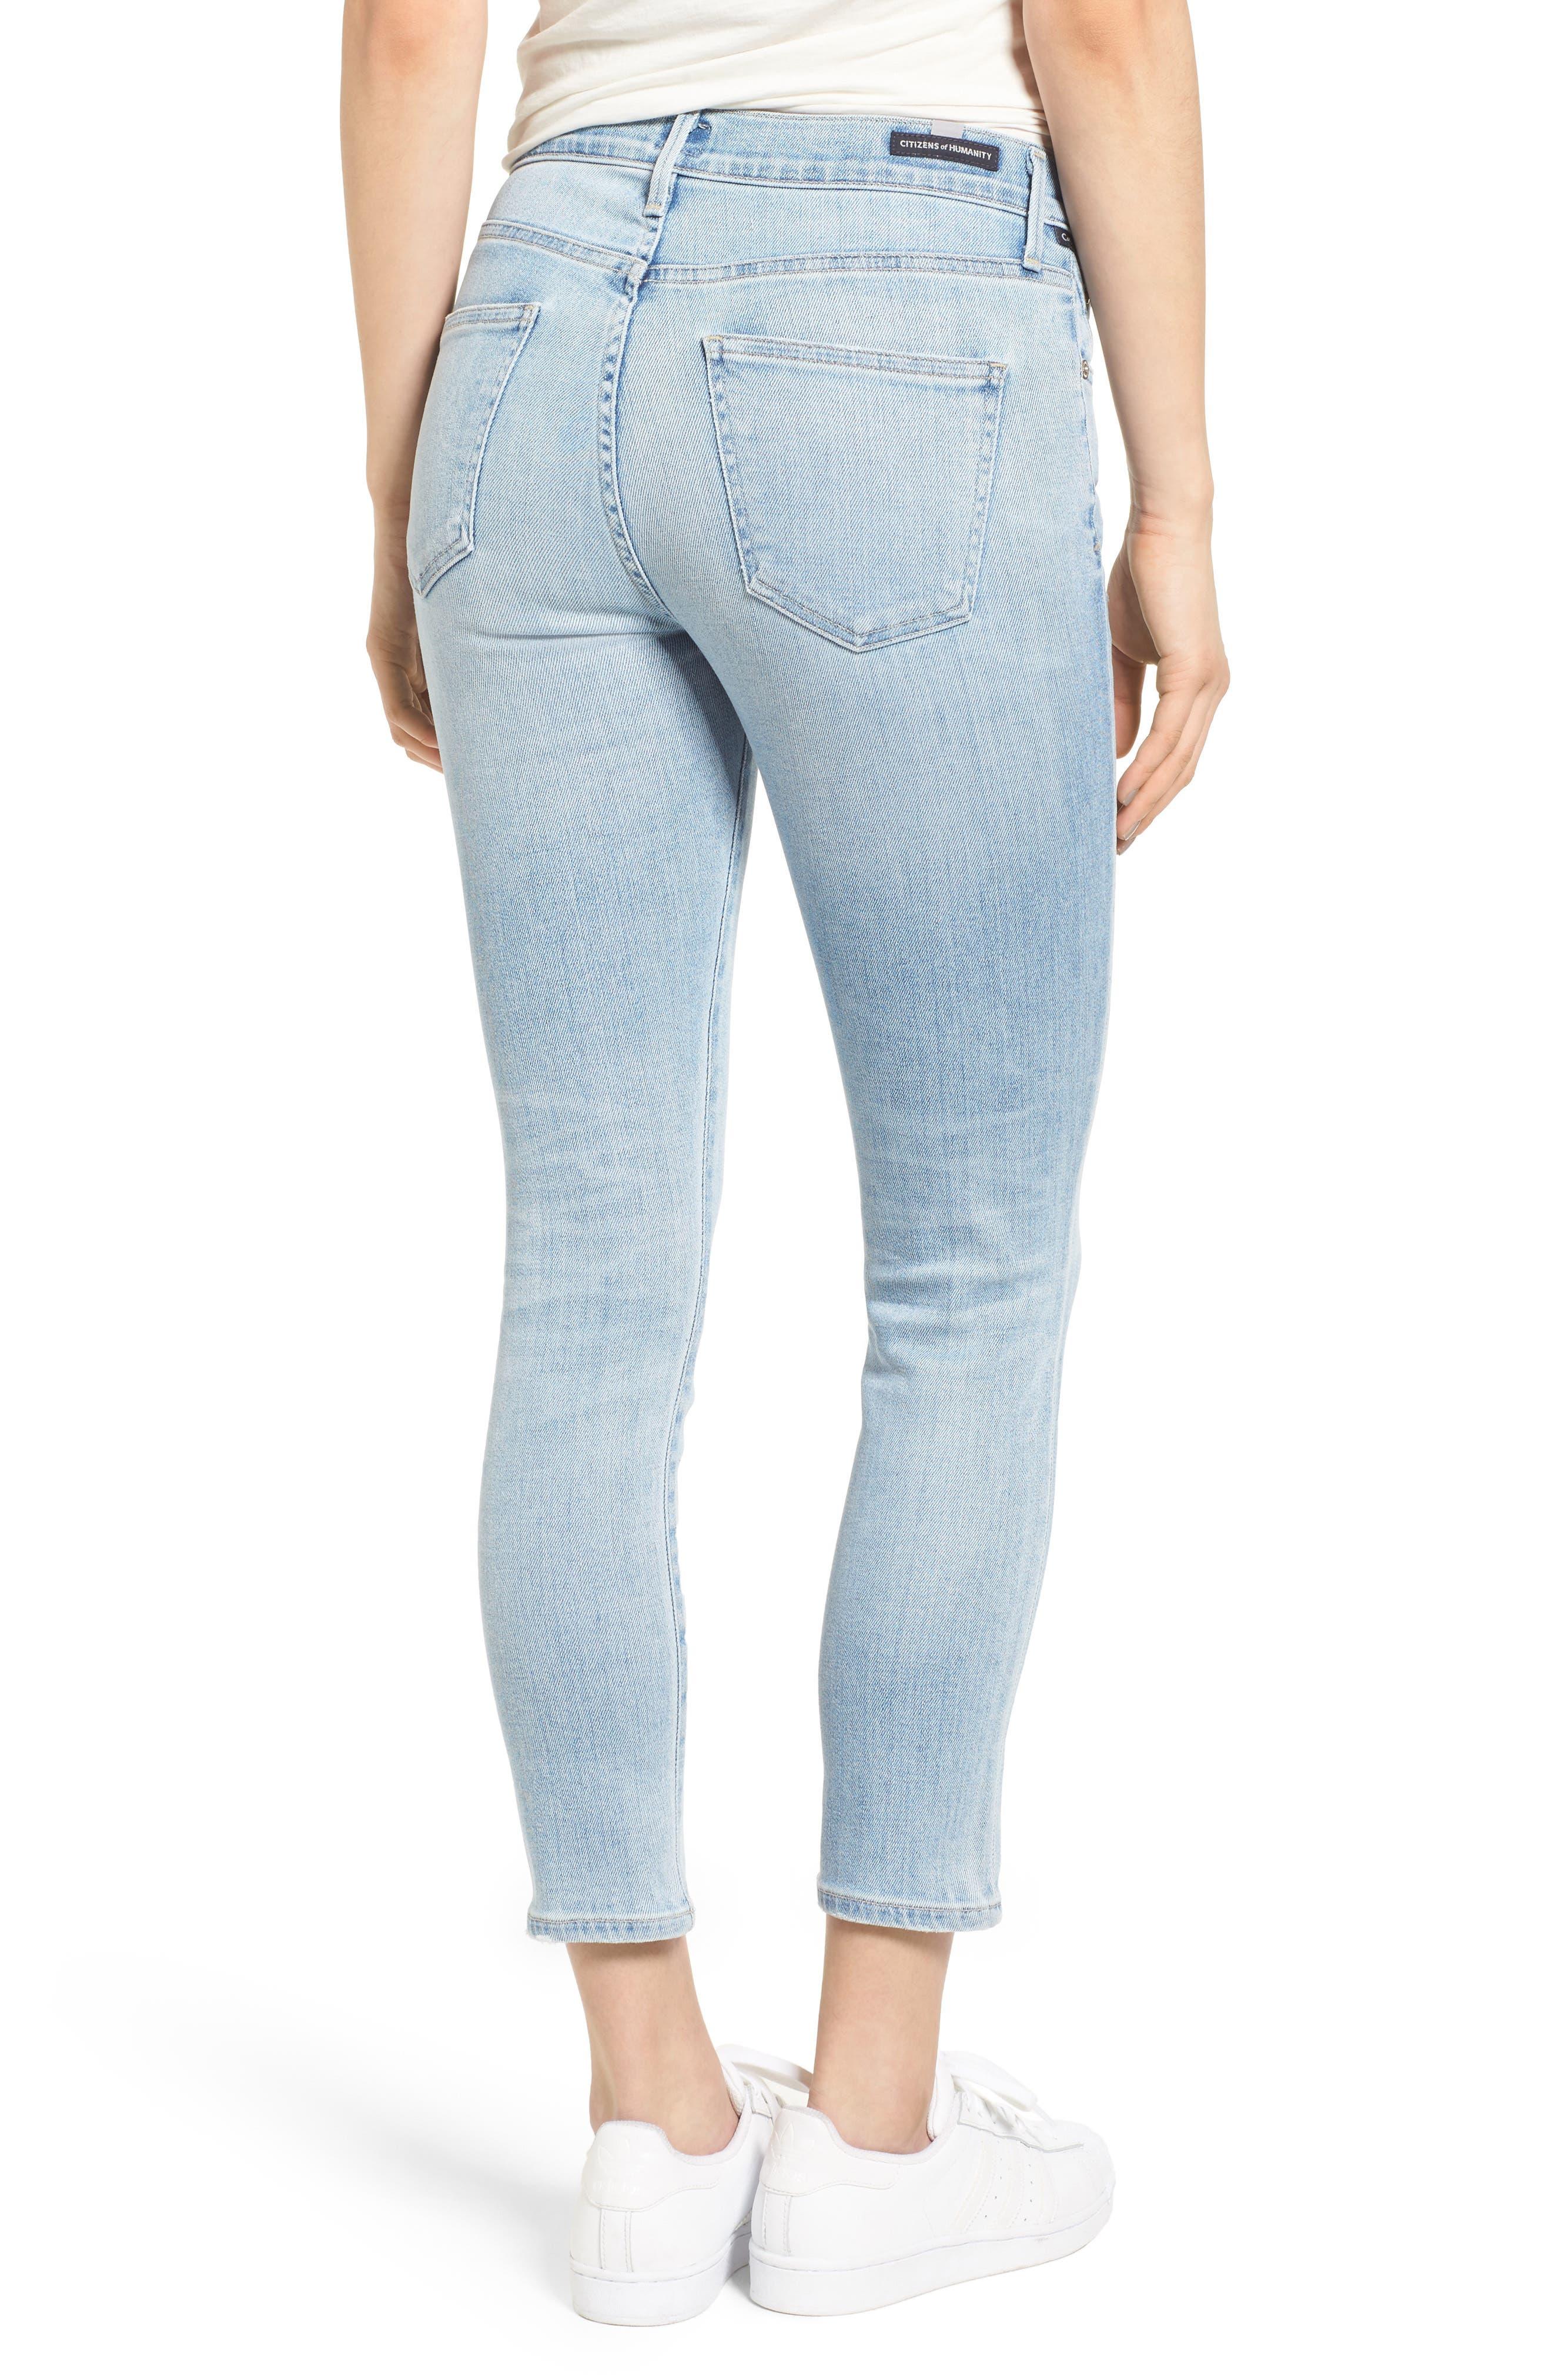 Rocket High Waist Crop Skinny Jeans,                             Alternate thumbnail 2, color,                             Oracle Blue